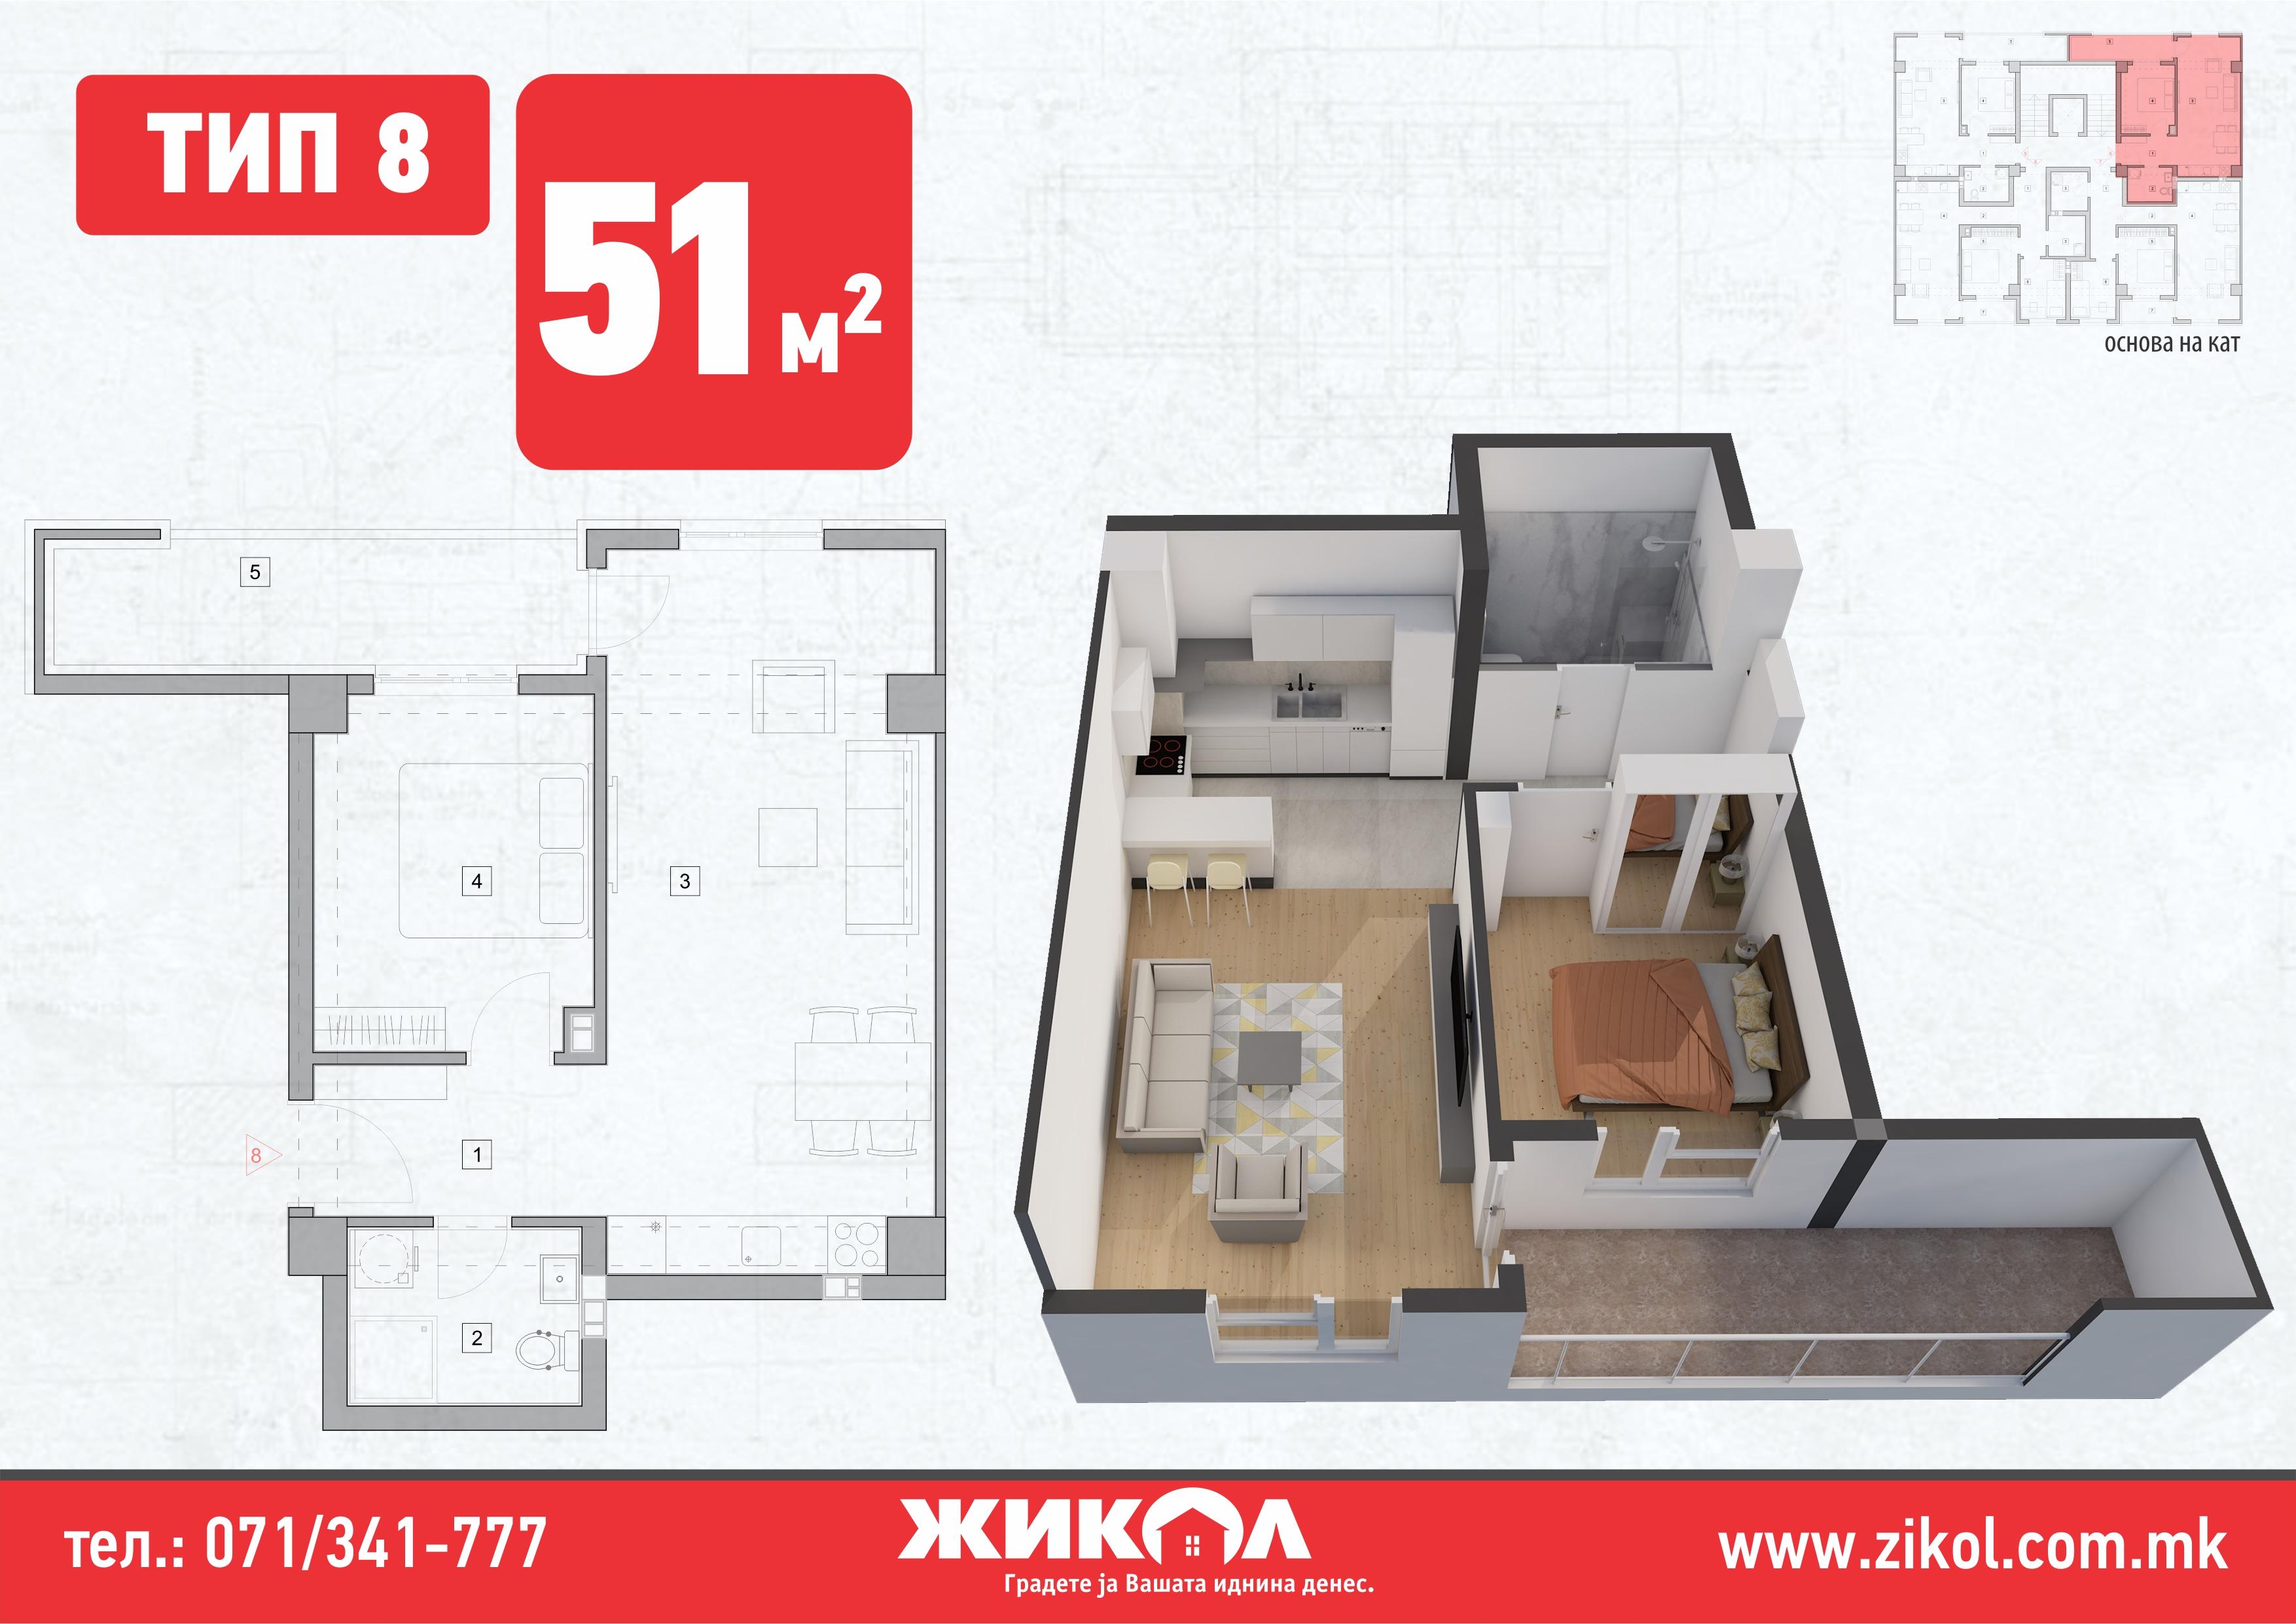 зграда 7, кат 1, стан 8